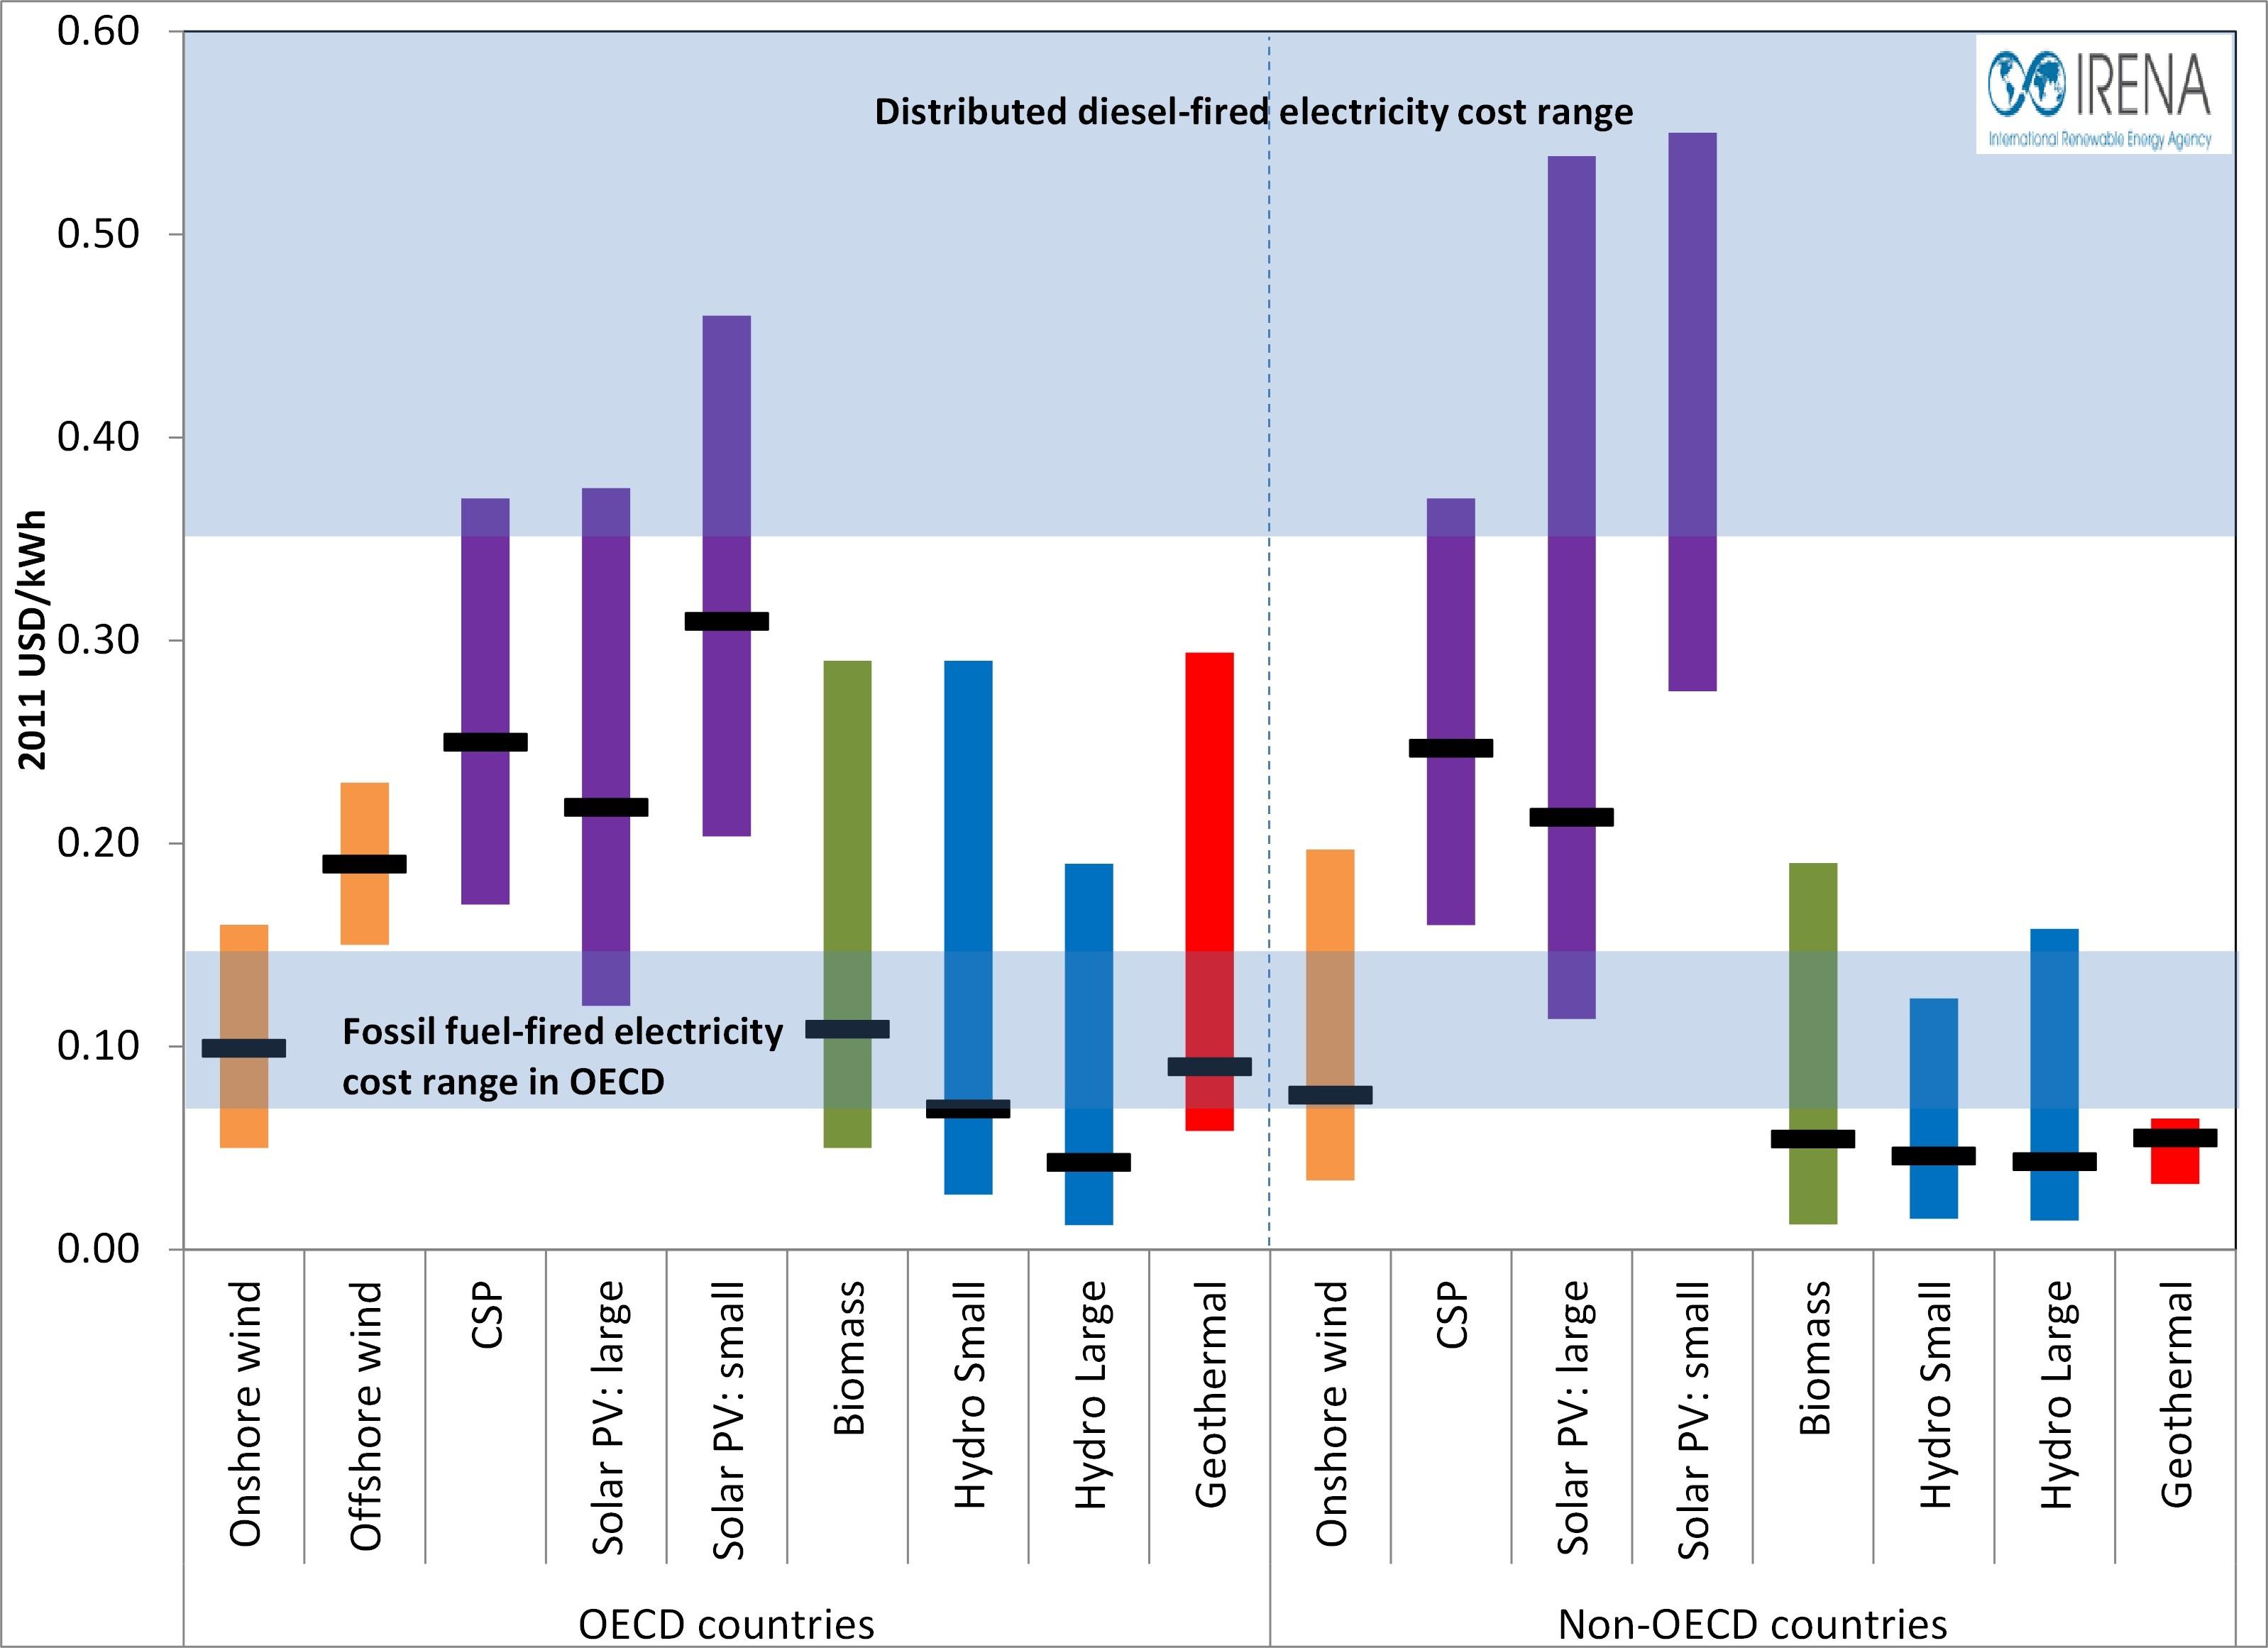 Cd Wind Power Diagram Diy Wiring Diagrams Geothermal Plant Rh Irena Org Generator Nuclear